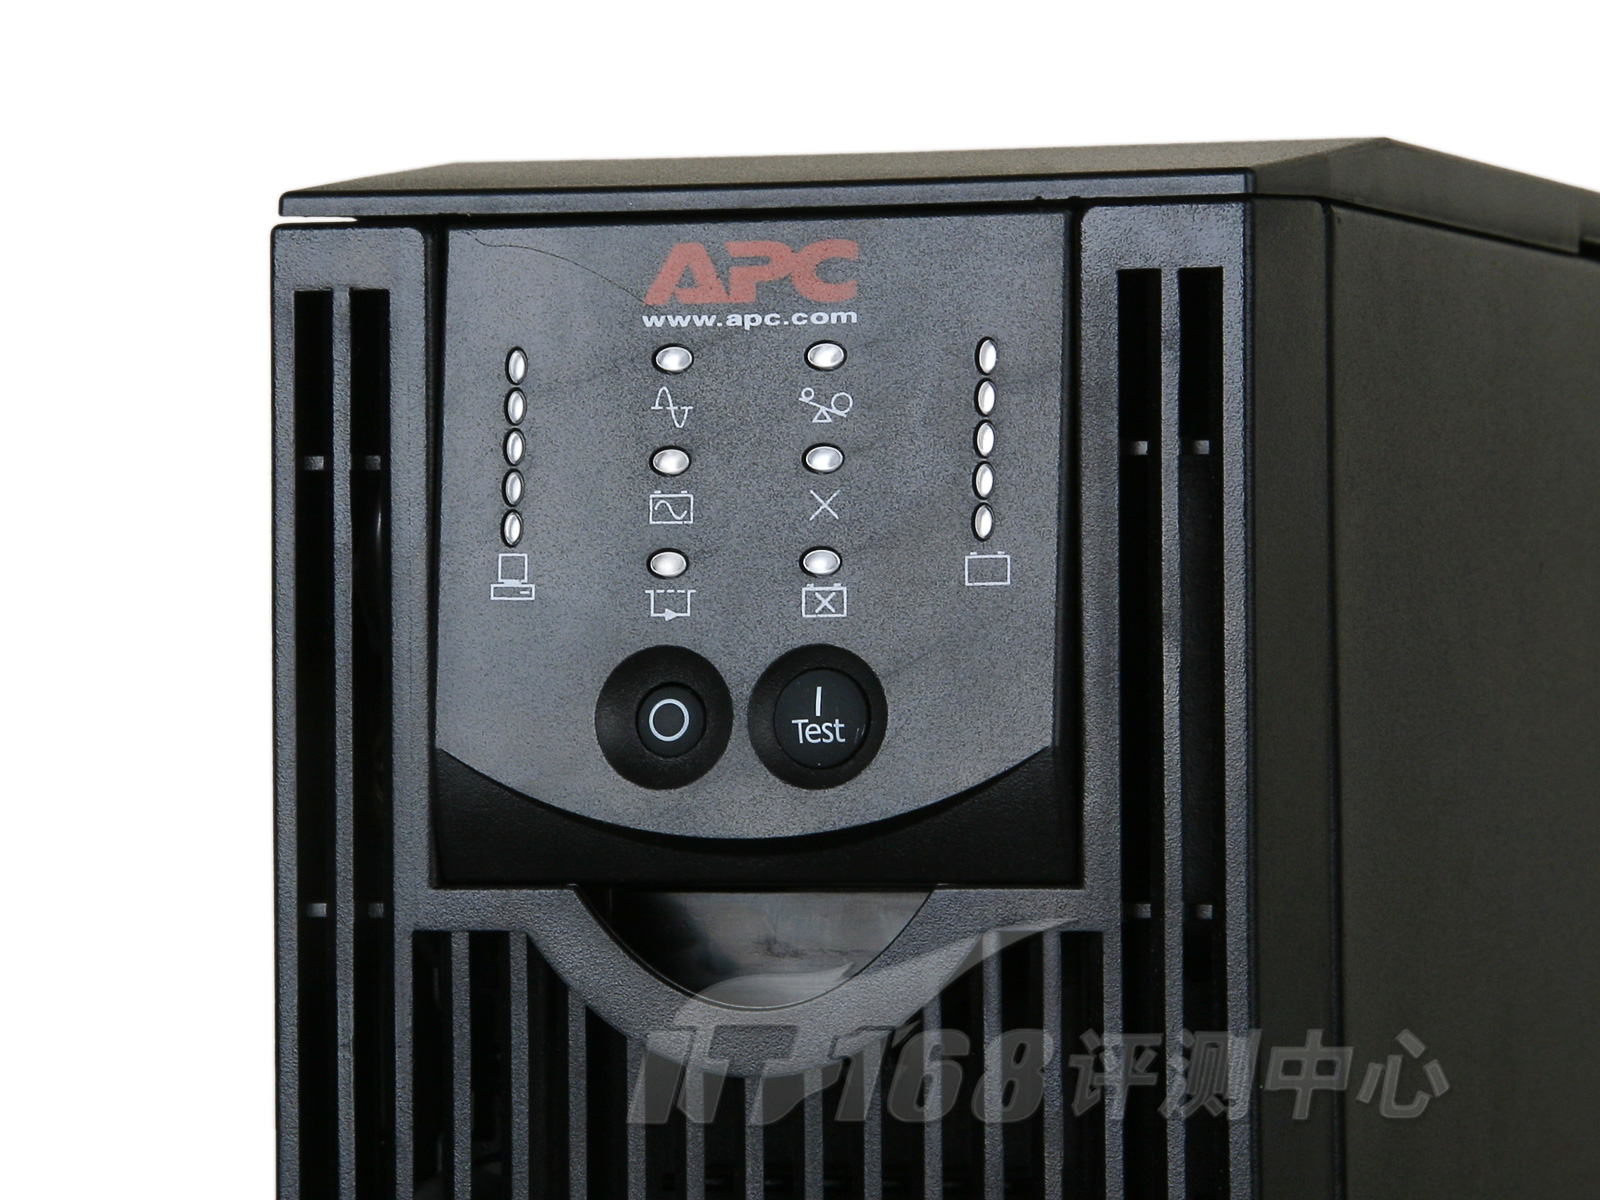 【IT168评测中心.产品预览】说起UPS(Uninterruptible Power Supply,不间断电源),许多人都会直接联想到机房。不错,除非您所在的地区电压极不稳定或者时常停电,普通用户绝对没理由购买这样的设备;而且从数据的安全性来说,机房数据显然更有保存的价值。之前,IT168评测中心很少接触这样的产品,虽然时常听说UPS的大名,不过真正见到实物的机会还不是很多。最近,APC送来了一款针对面向机房使用的UPS,型号为APC Smart-UPS RT 3000VA。下面我们就来一起看看这款